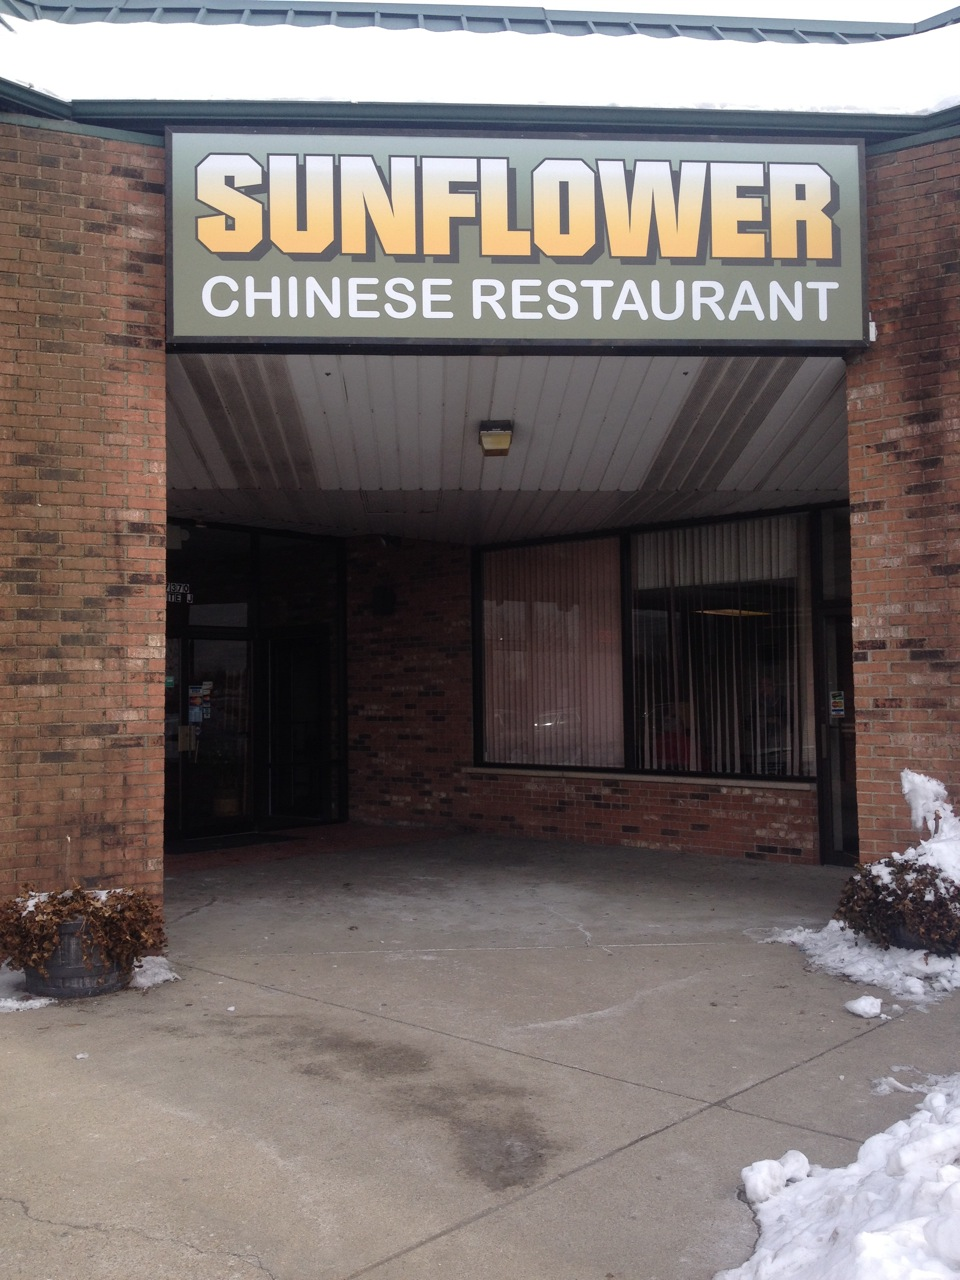 Sunflower Chinese Restaurant Lounge Dublin Oh